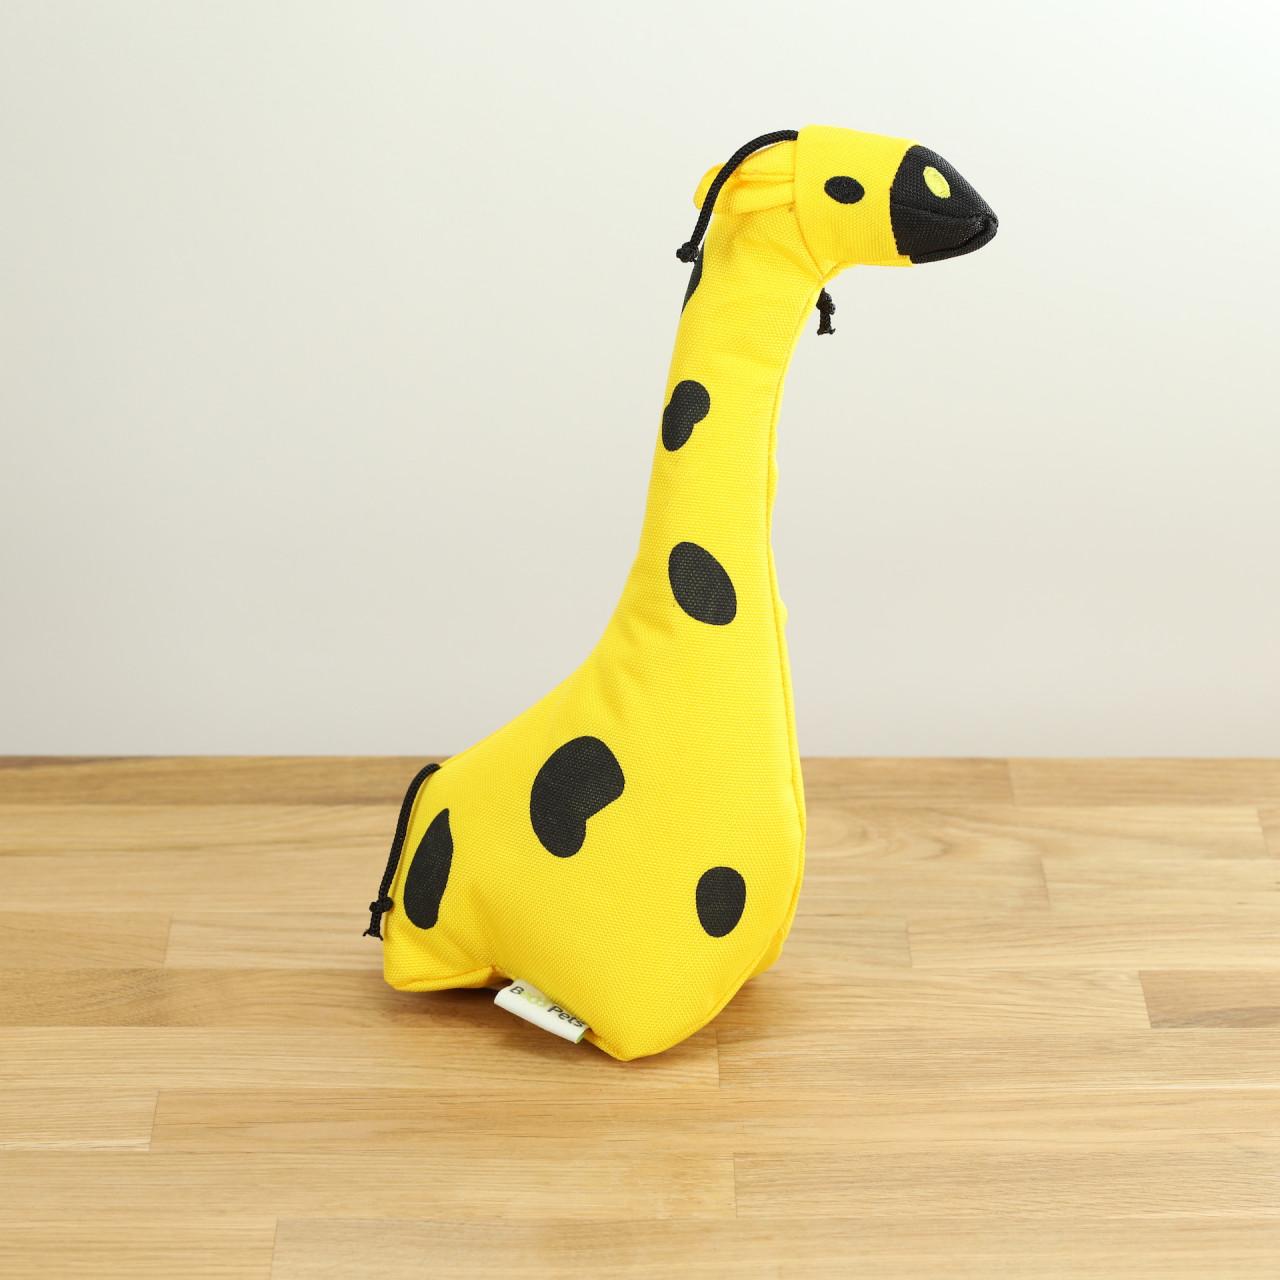 Hundespielzeug George, die Giraffe